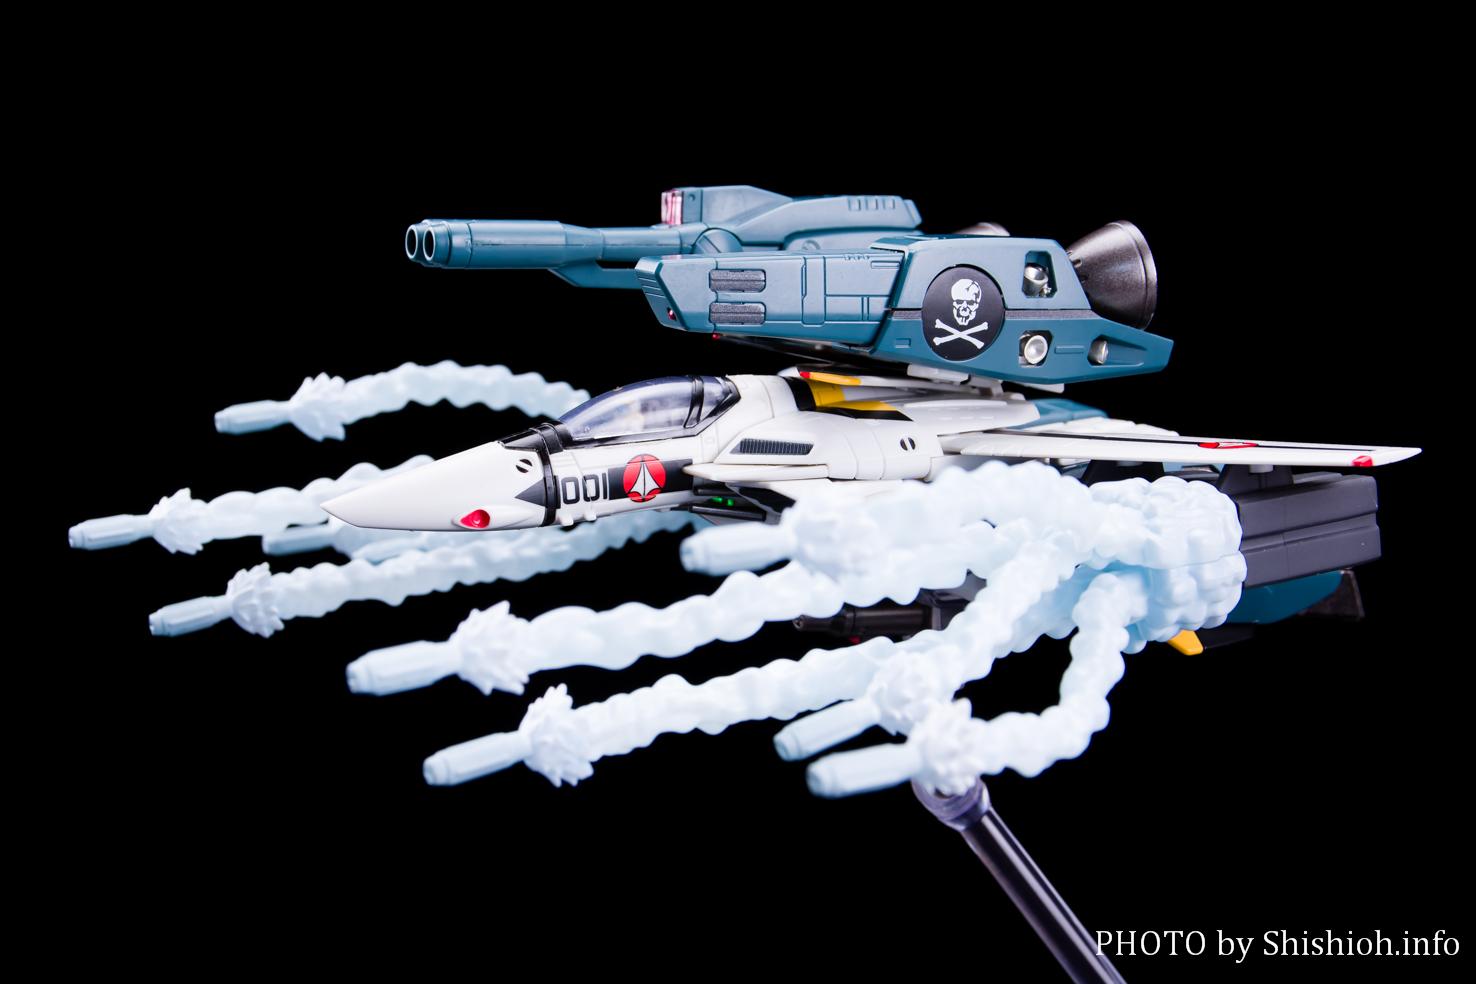 HI-METAL R スーパーバルキリー用ミサイルエフェクトセット